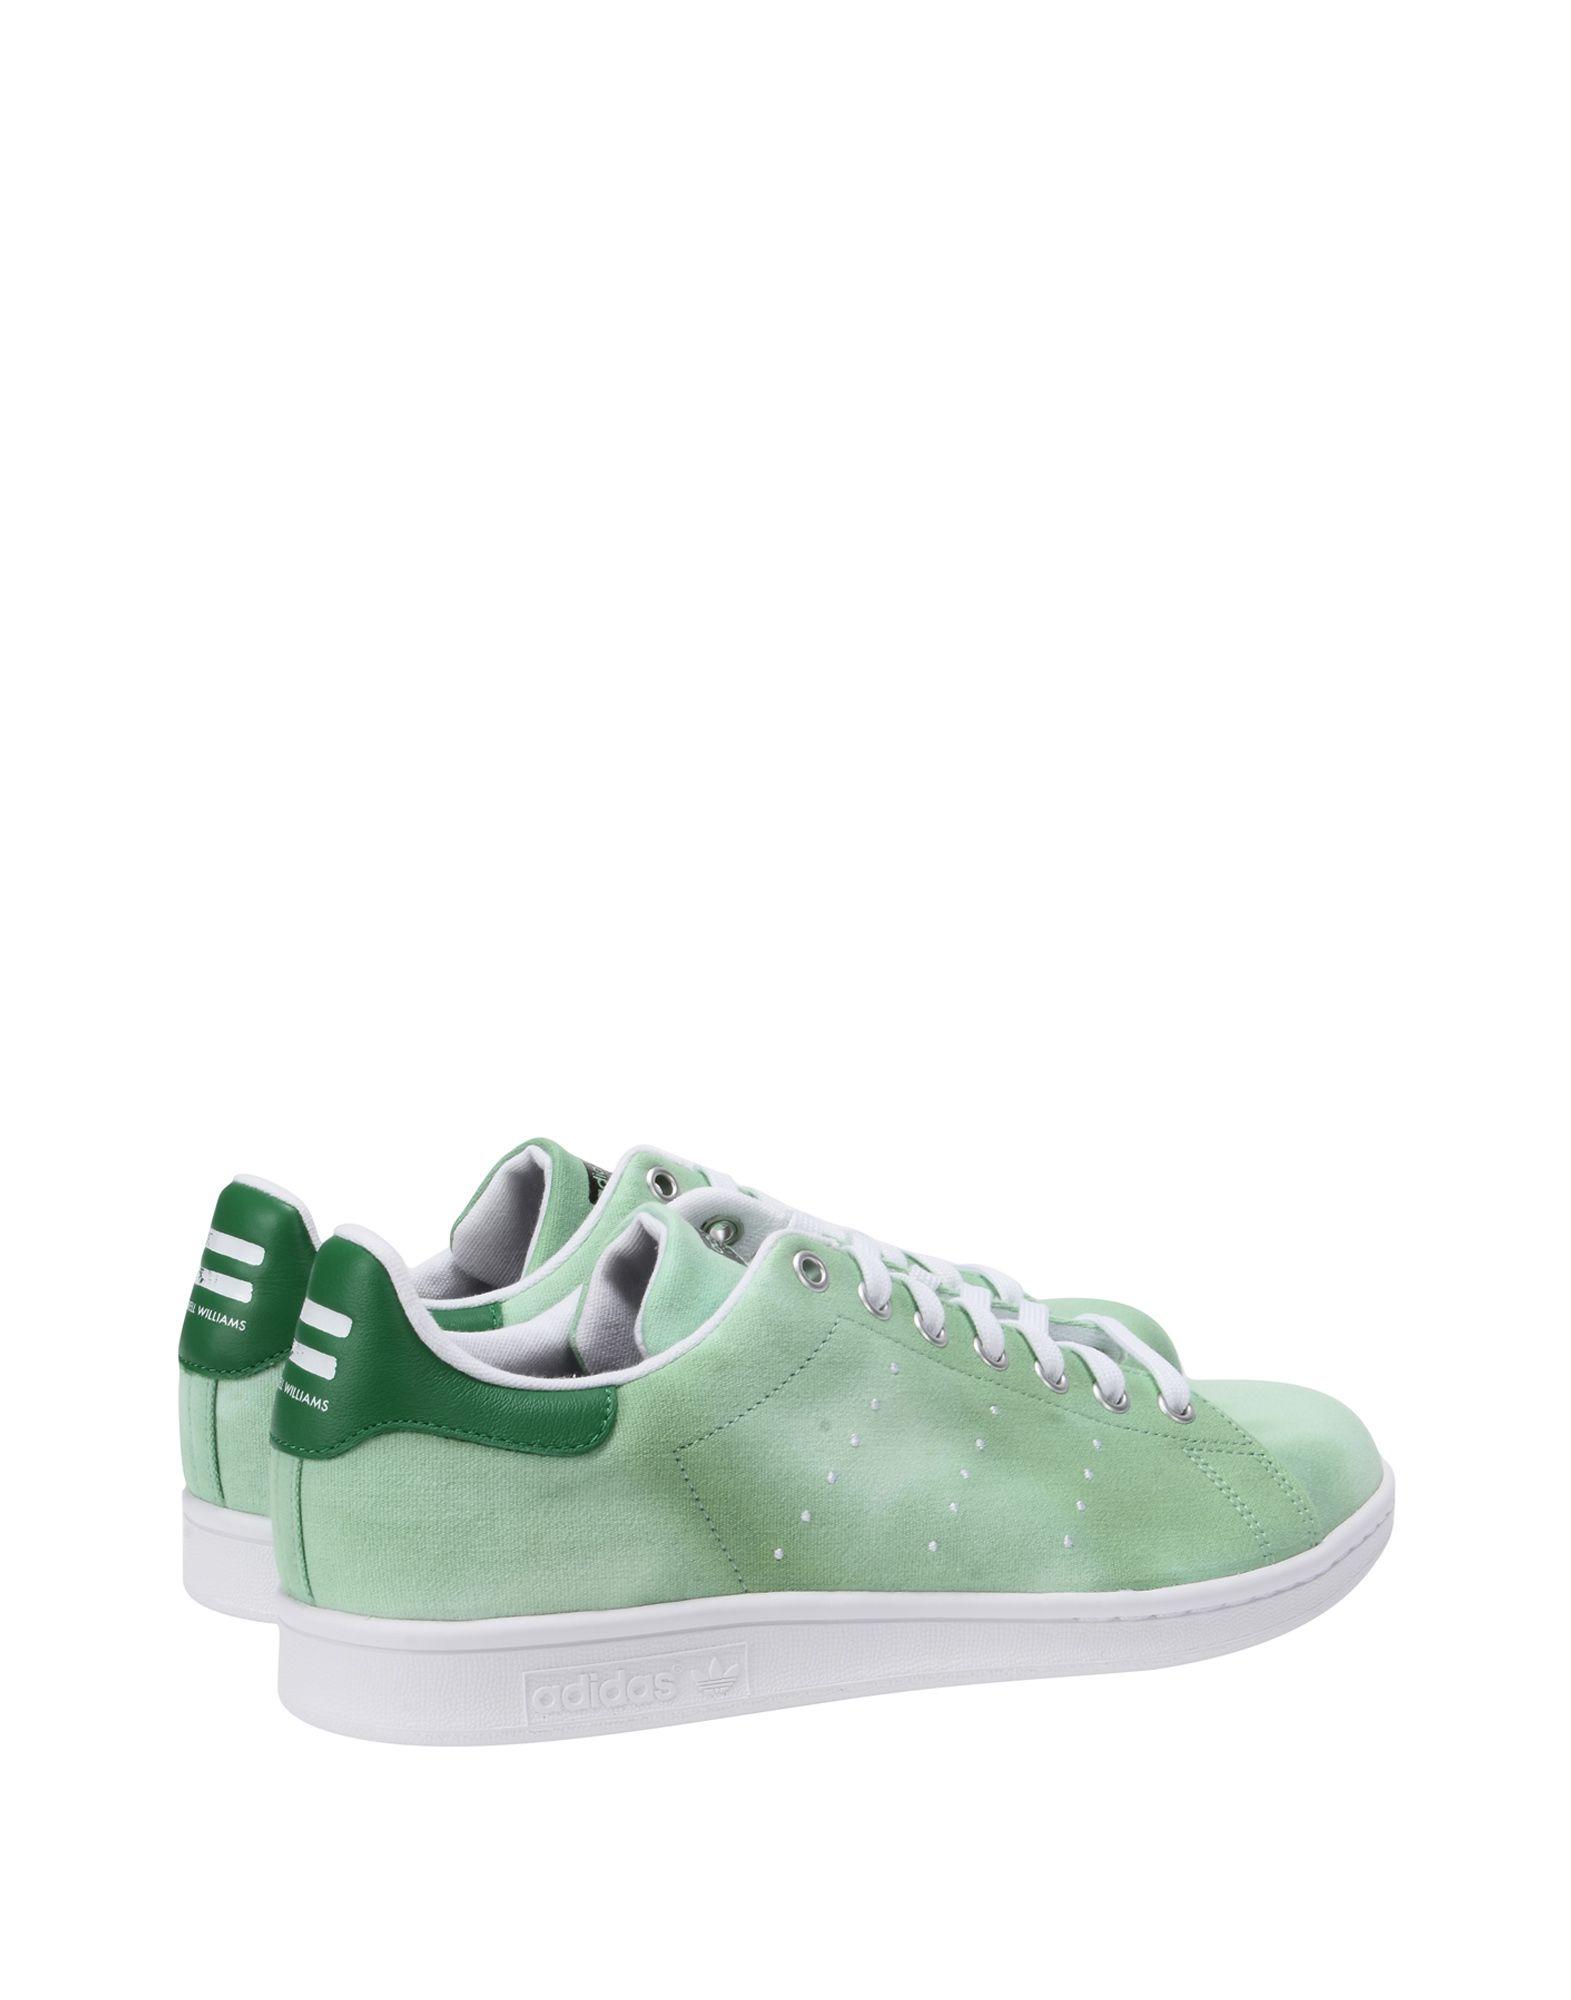 Sneakers Adidas Originals By Pharrell Williams Pw Hu Holi Stan Smit - Uomo - 11458316BA